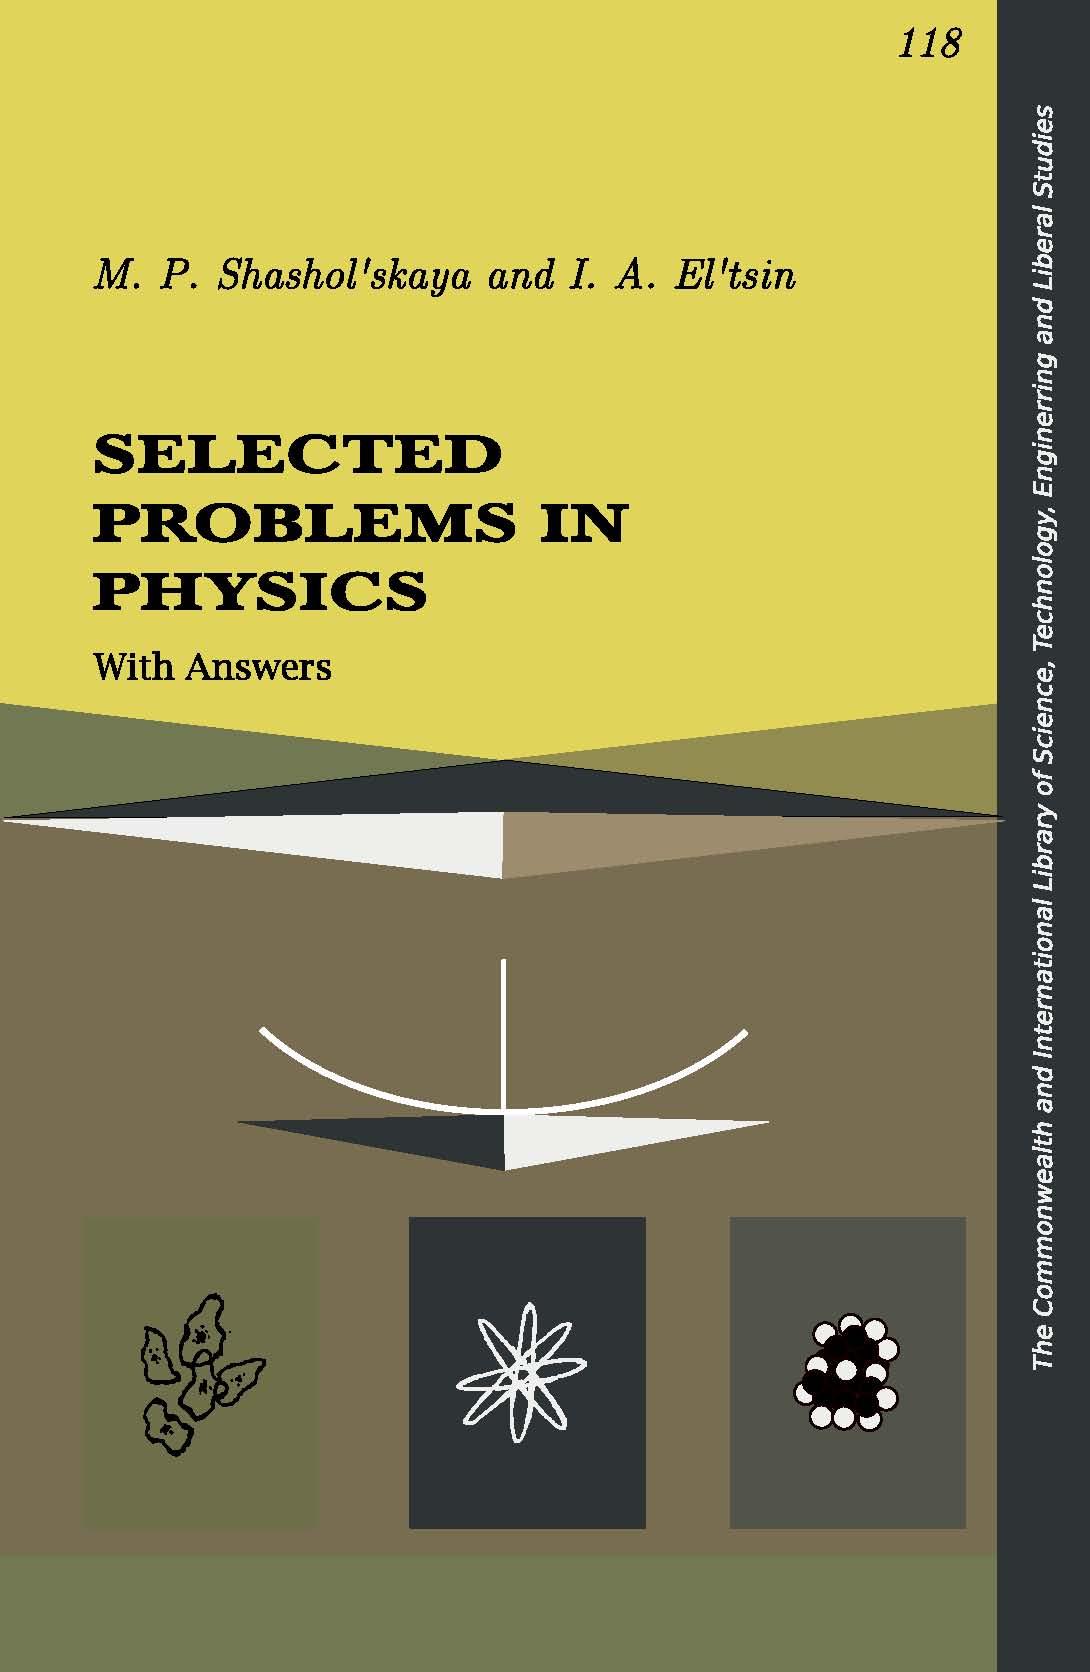 Selected Problems in Physics – Shaskol'skaya and El'tsin   Mir Books